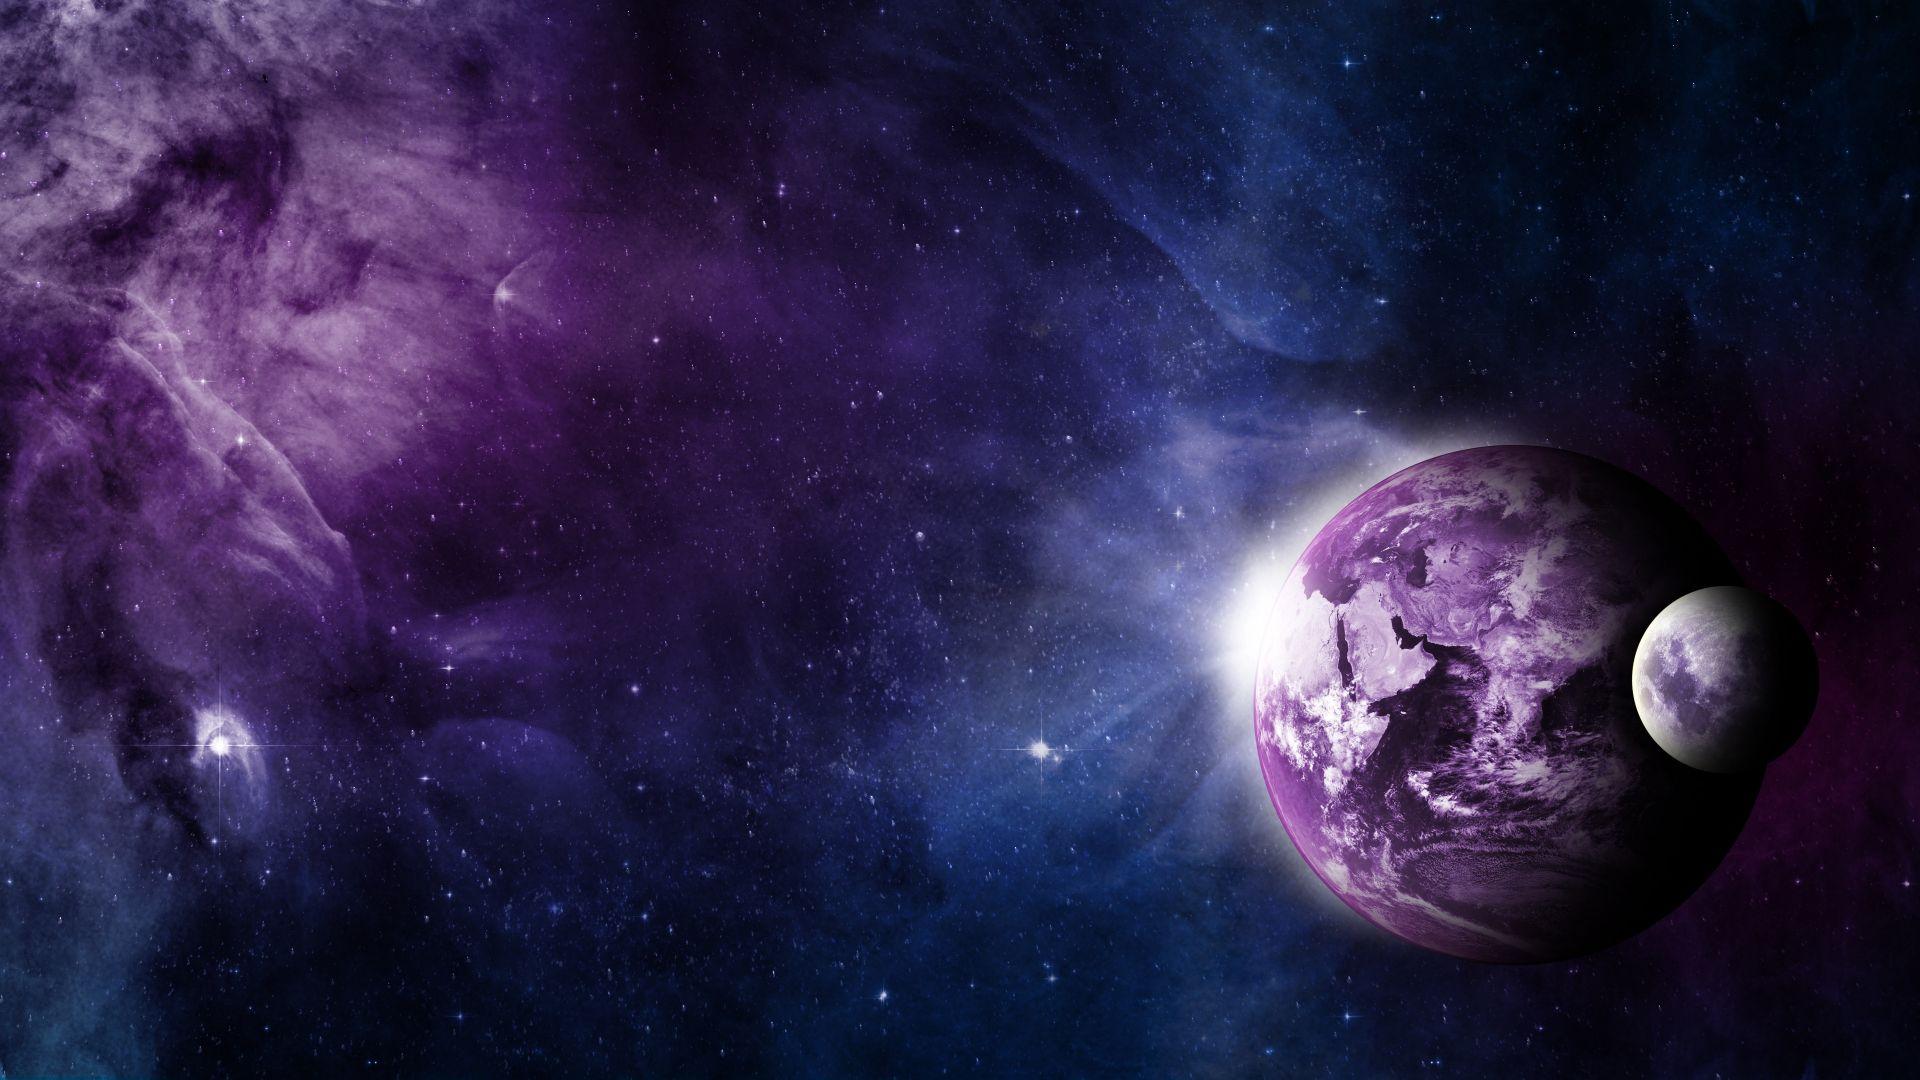 Wallpaper space, galaxy, planet, 4k, Space #17065